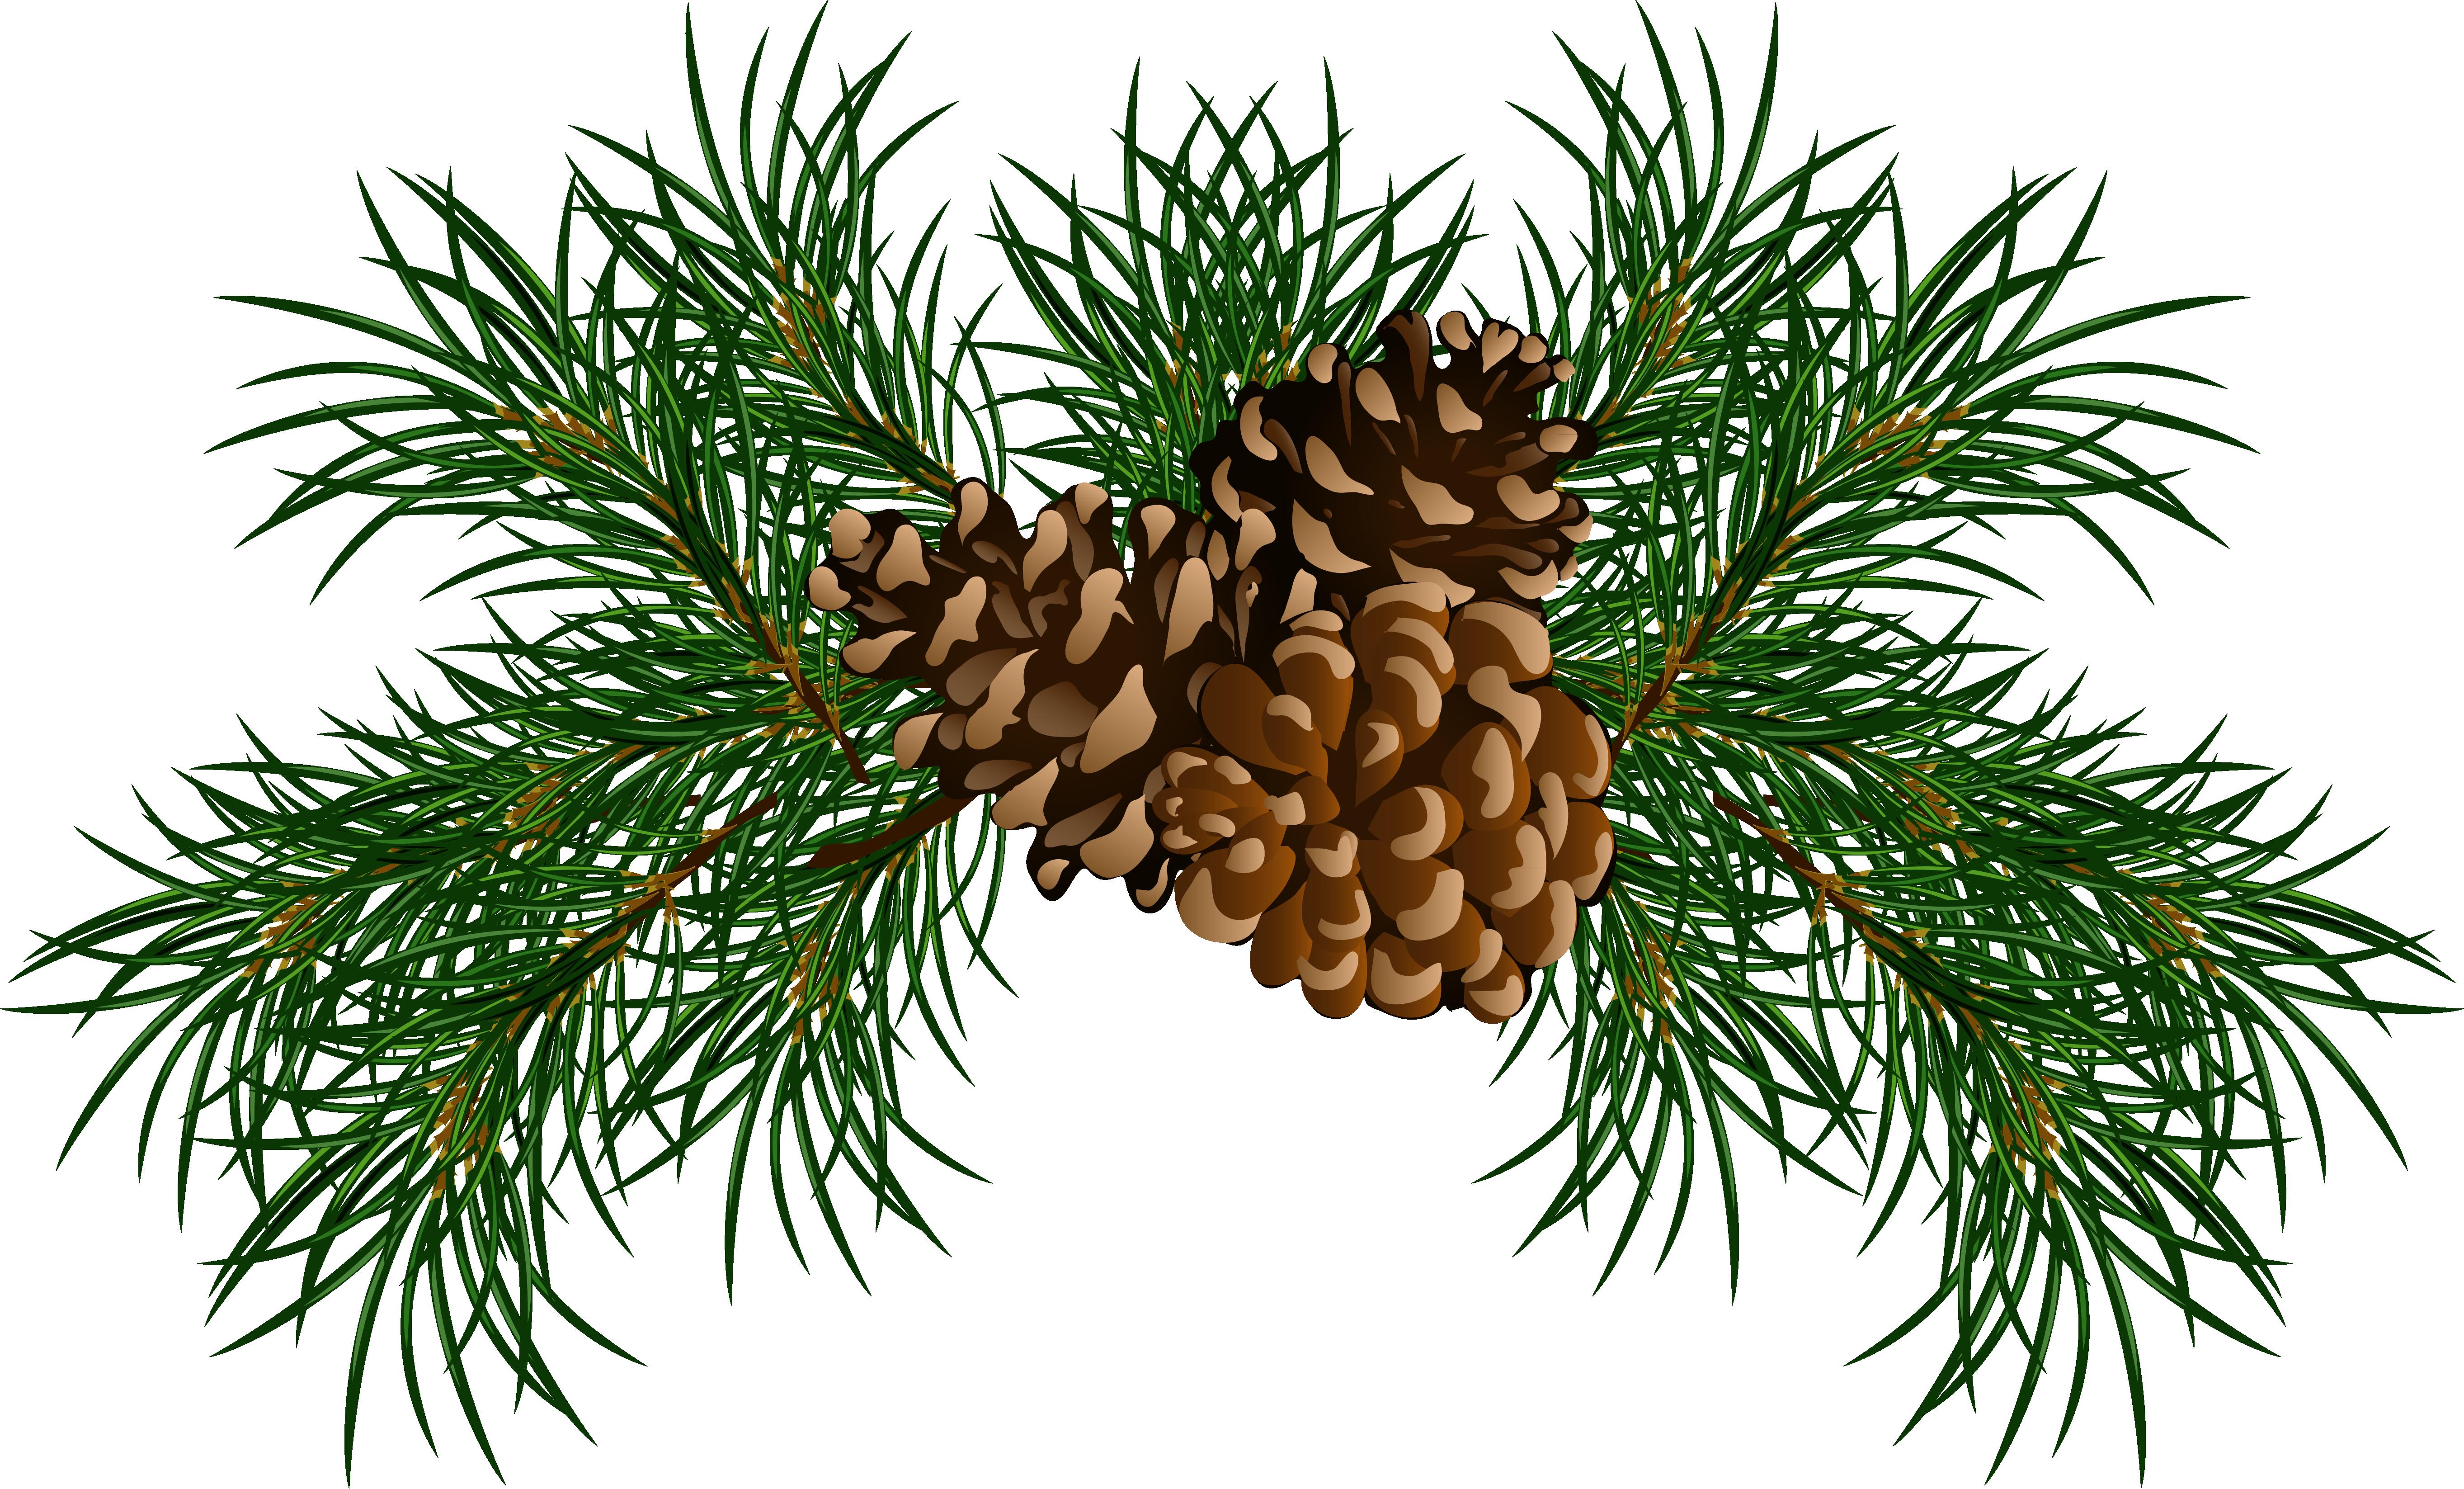 Pine bough clipart.